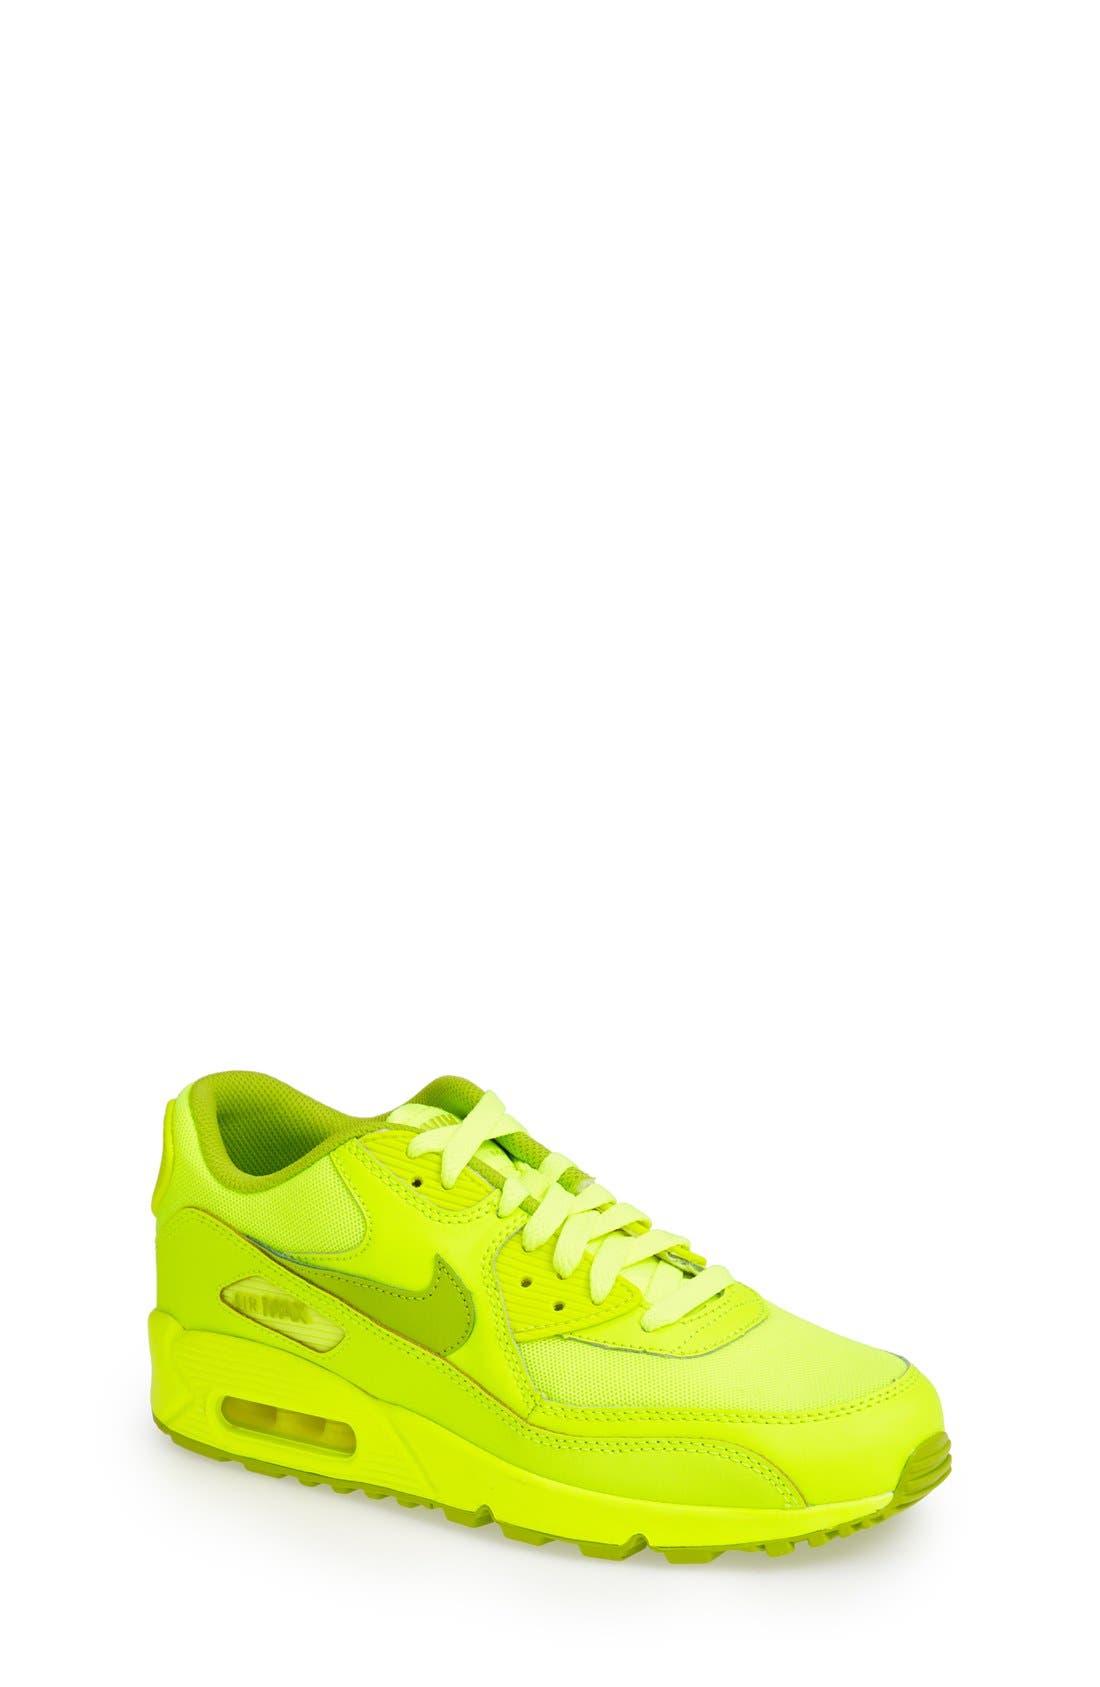 Main Image - Nike 'Air Max Classic' Running Shoe (Little Kid & Big Kid)